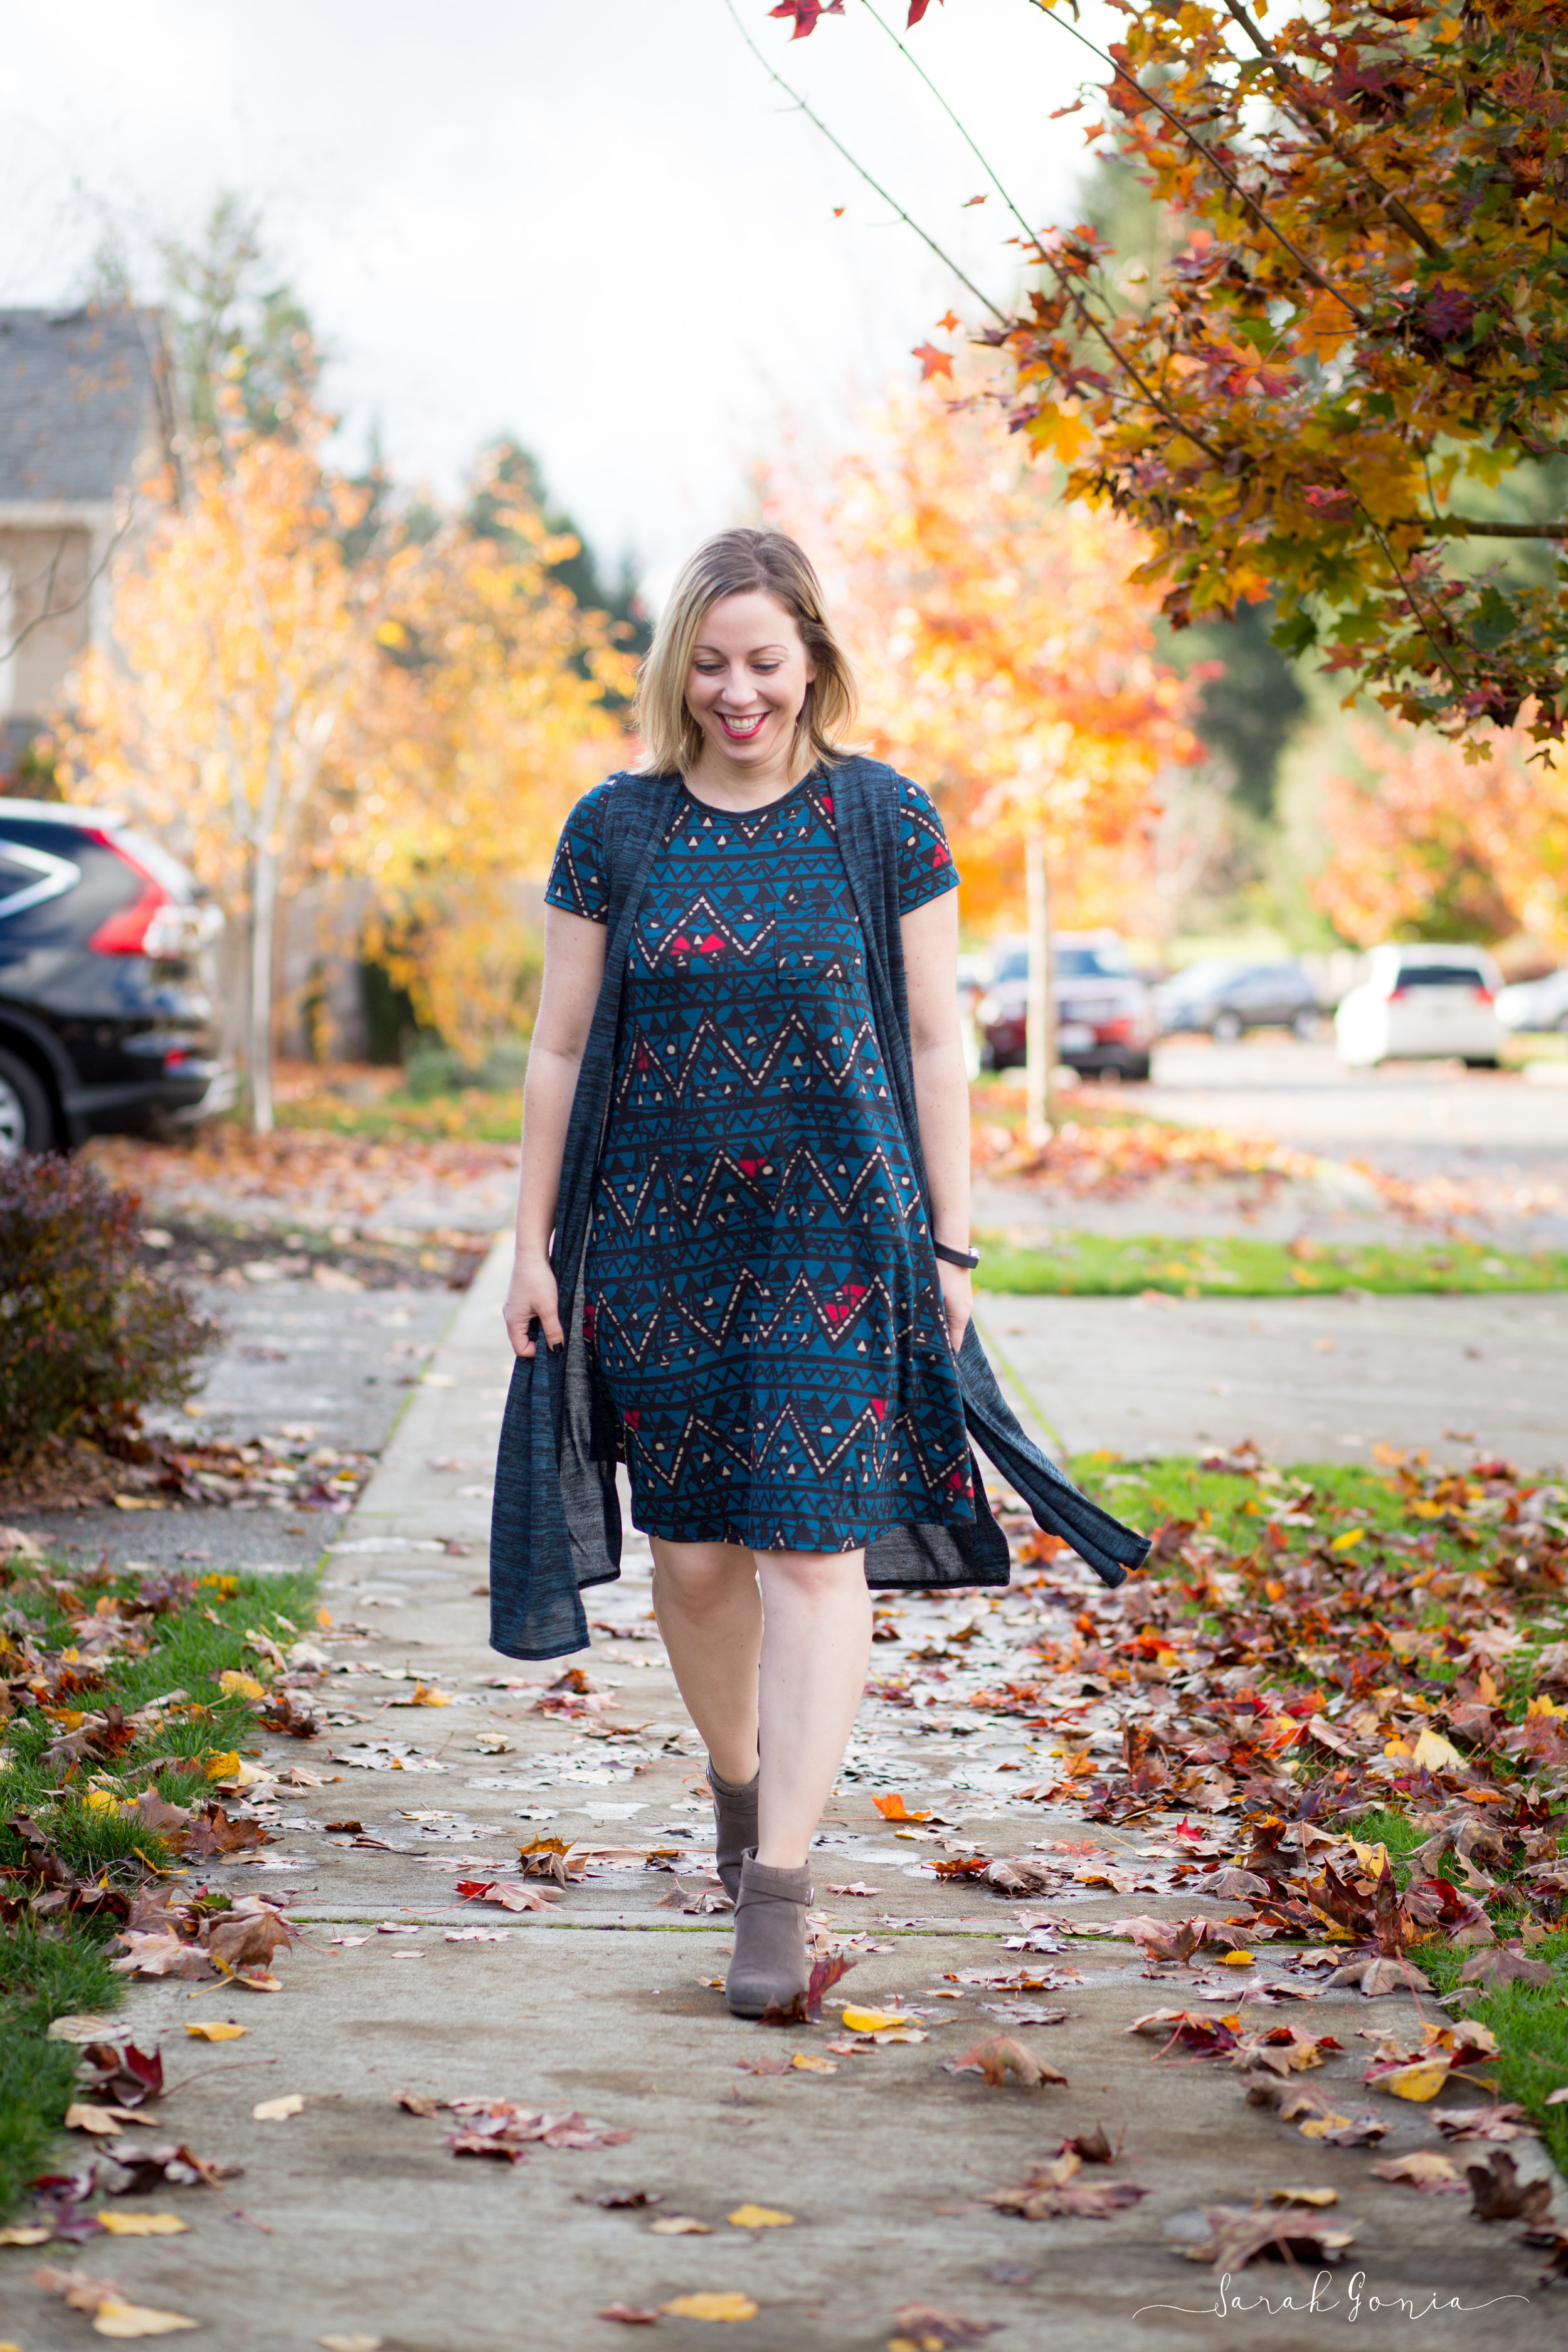 Meet Kristin! The mastermind behind the Lularoe Self-Love experience. Isn't she gorgeous!